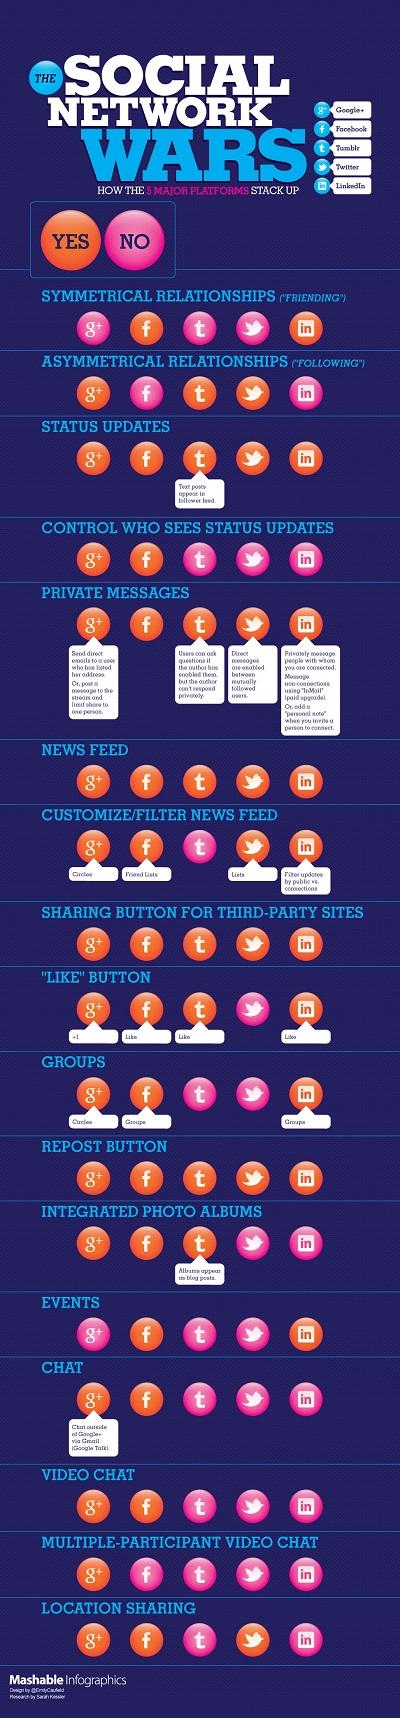 Social Network Comparison